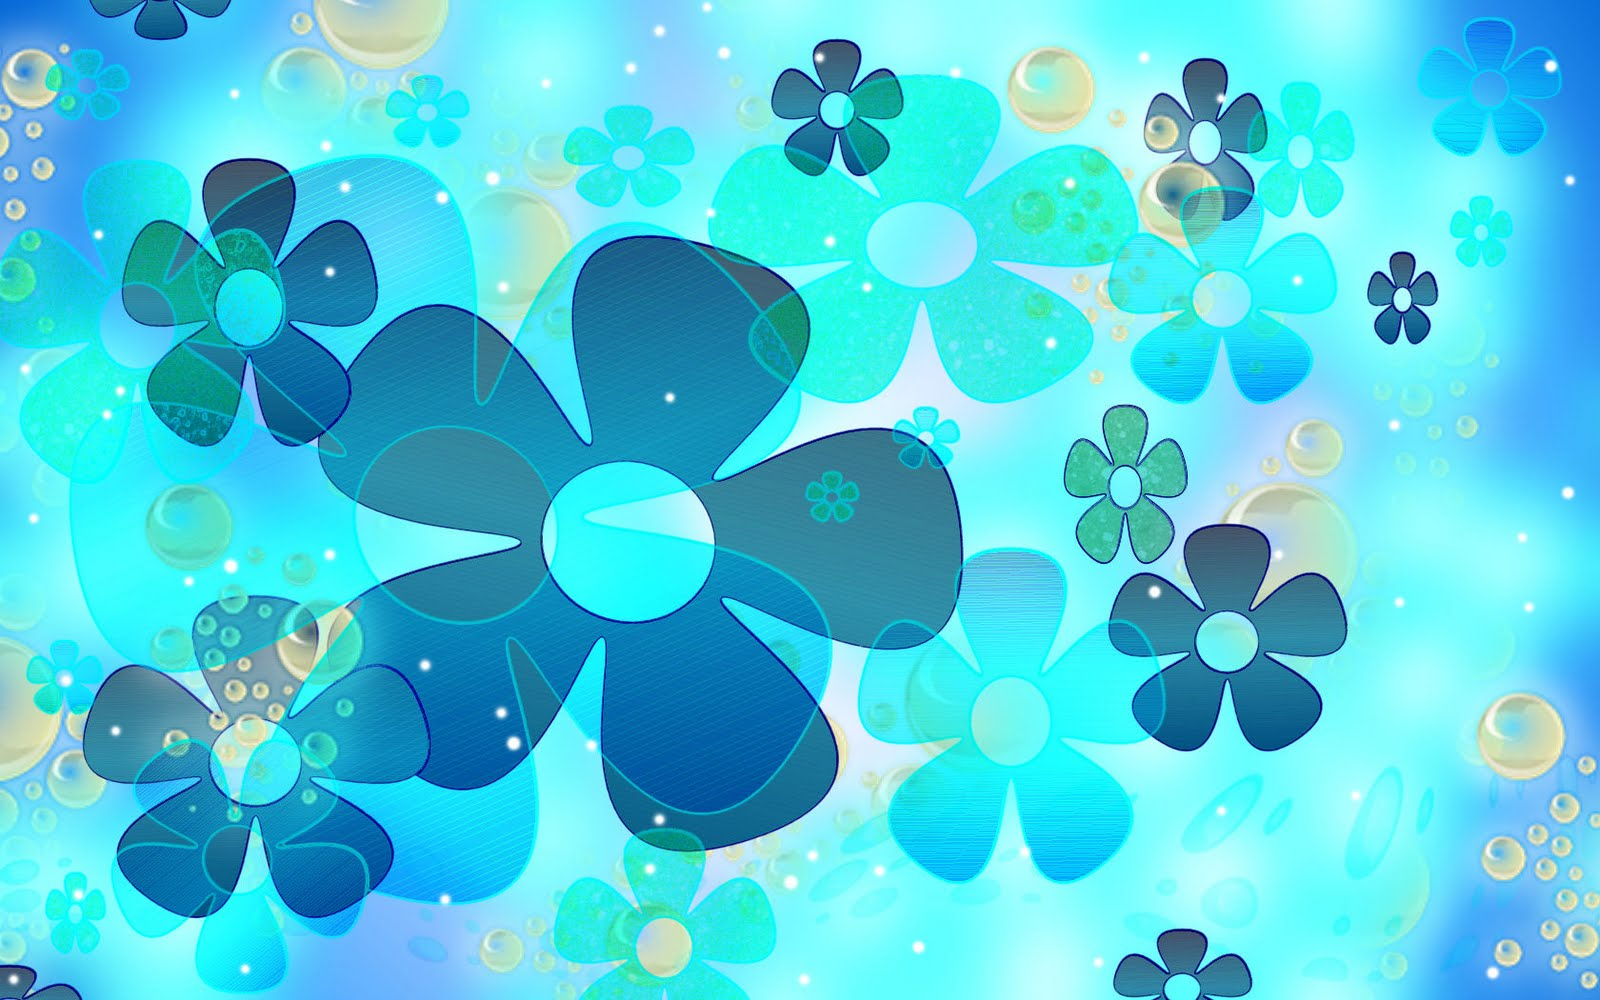 Free Download Blue Flowers Wallpaper Blue Flowers Wallpaper Blue